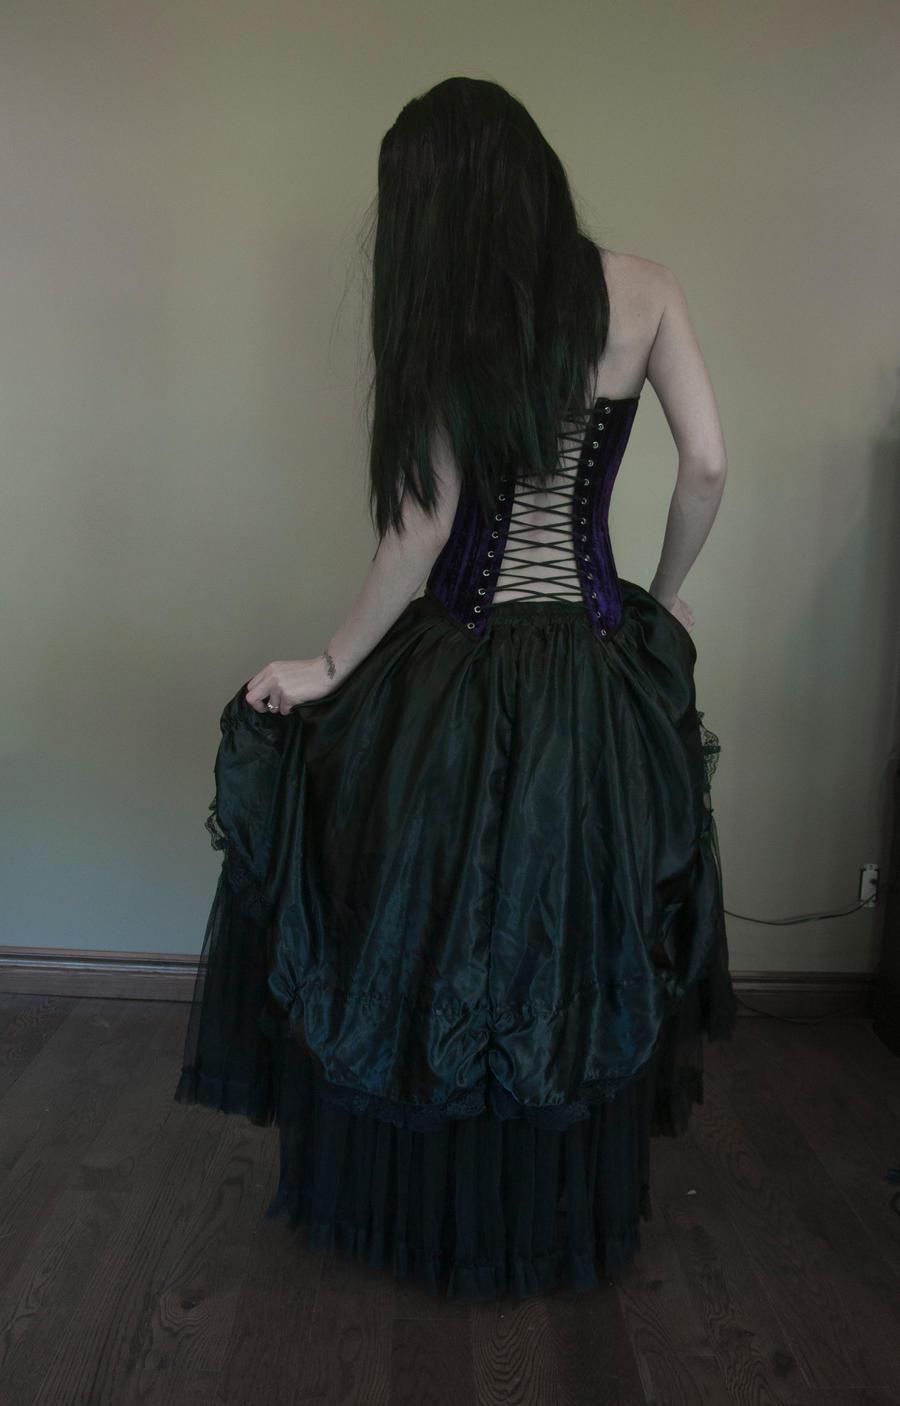 Goth Stock 014 by MeetMeAtTheLake2Nite